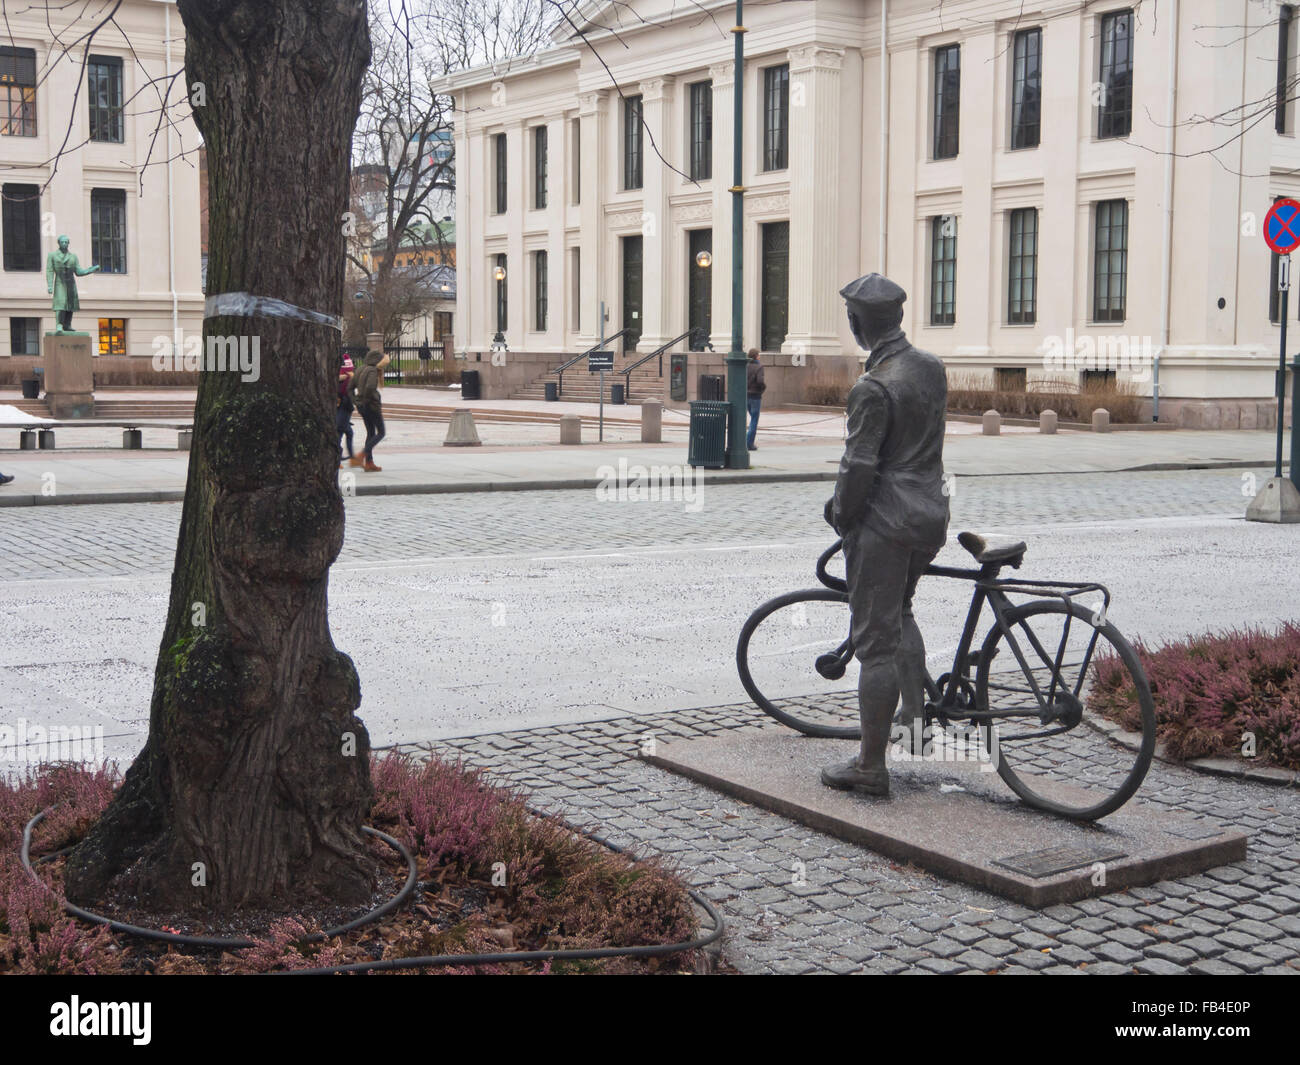 Sculpture of the Norwegian war hero Gunnar Sønsteby with bike in Karl Johans gate Oslo Norway, fought in WWII, - Stock Image